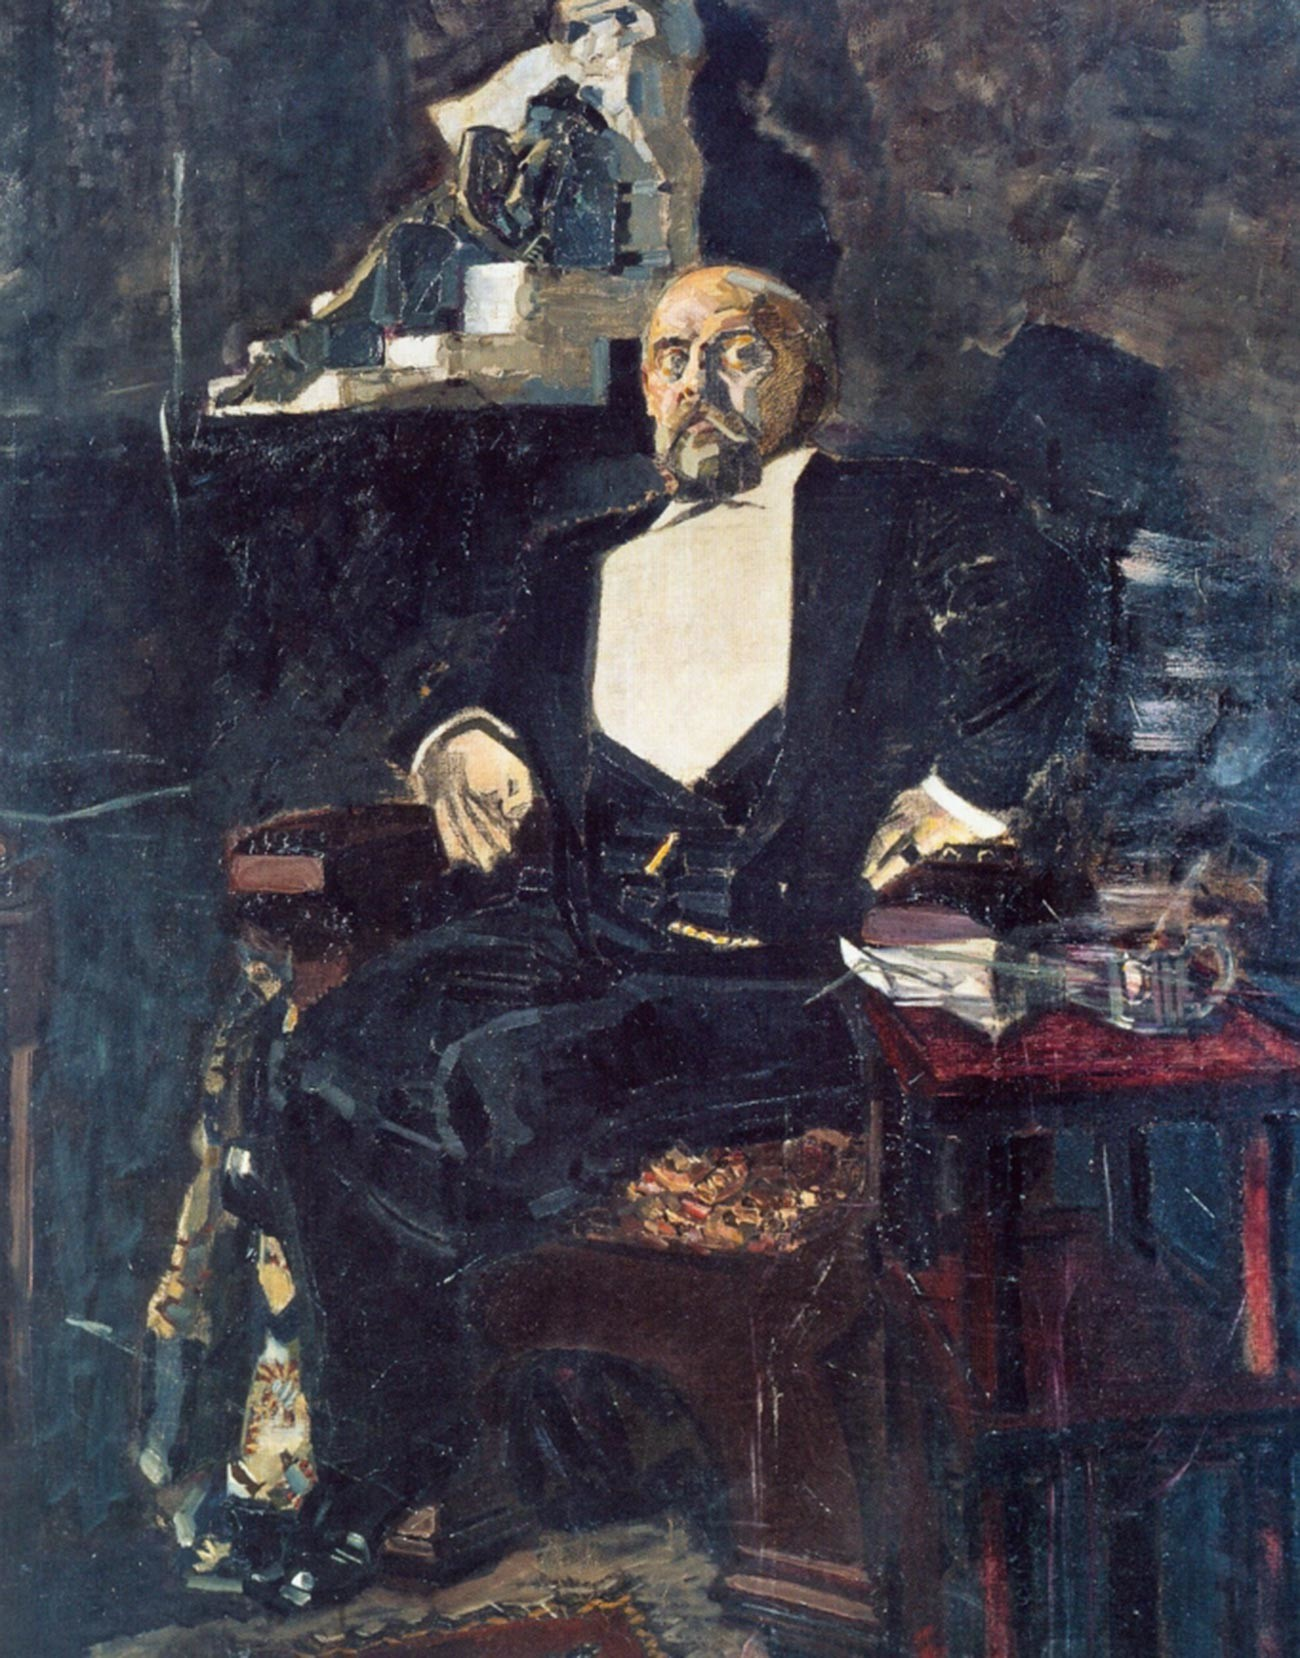 Mikhaíl Vrúbel. Retrato de Sávva Mamontov.